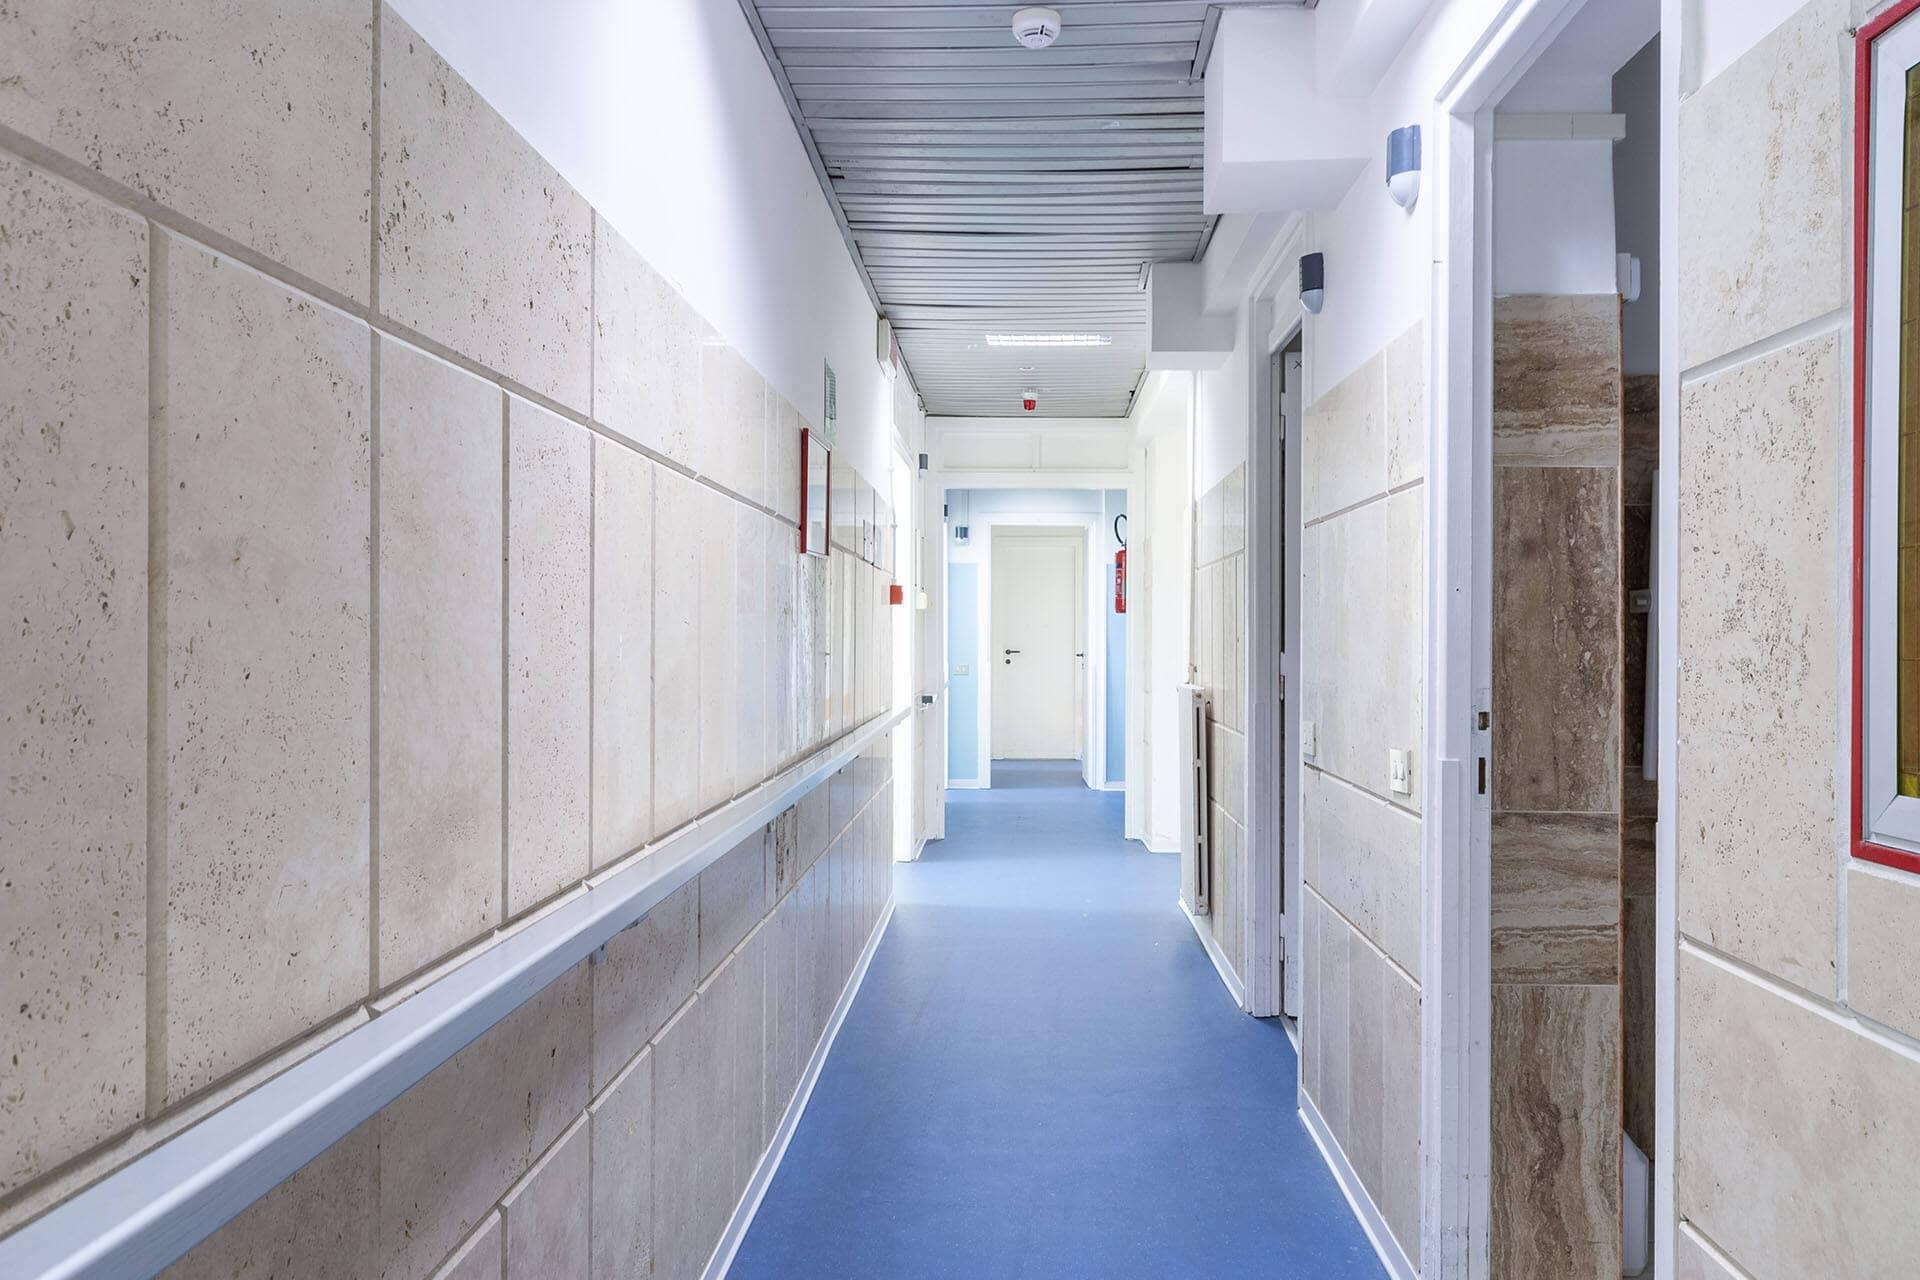 RSA Casa degli Angeli Custodi - Interni